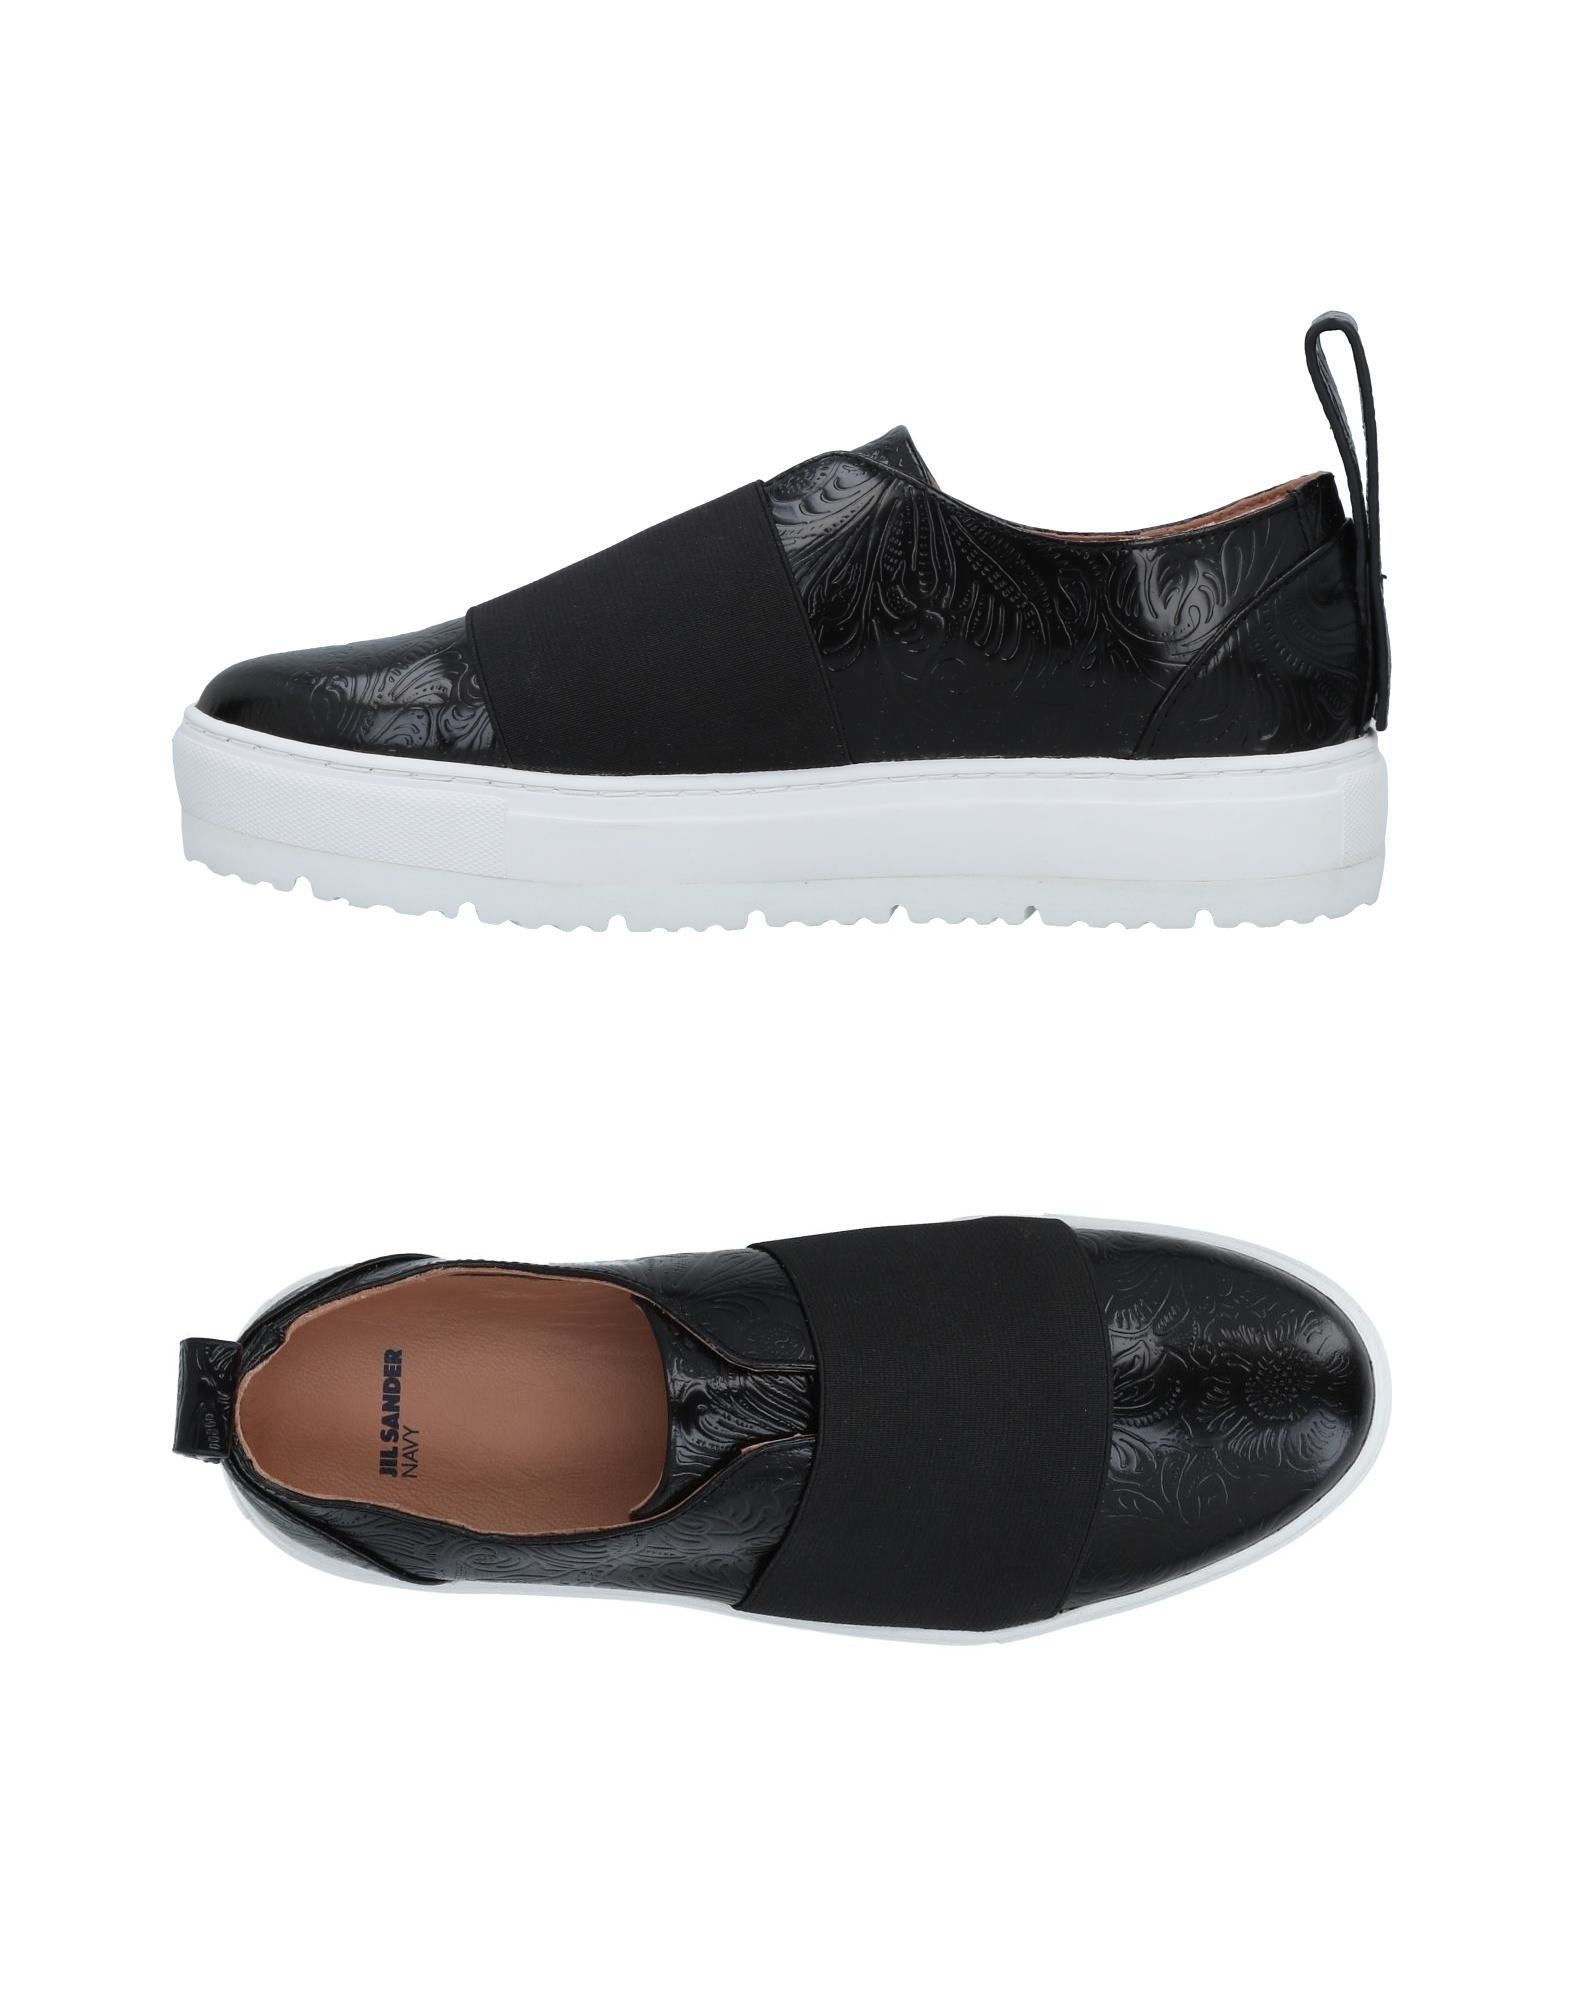 JIL SANDER NAVY Низкие кеды и кроссовки кеды кроссовки низкие element topaz navy paisley